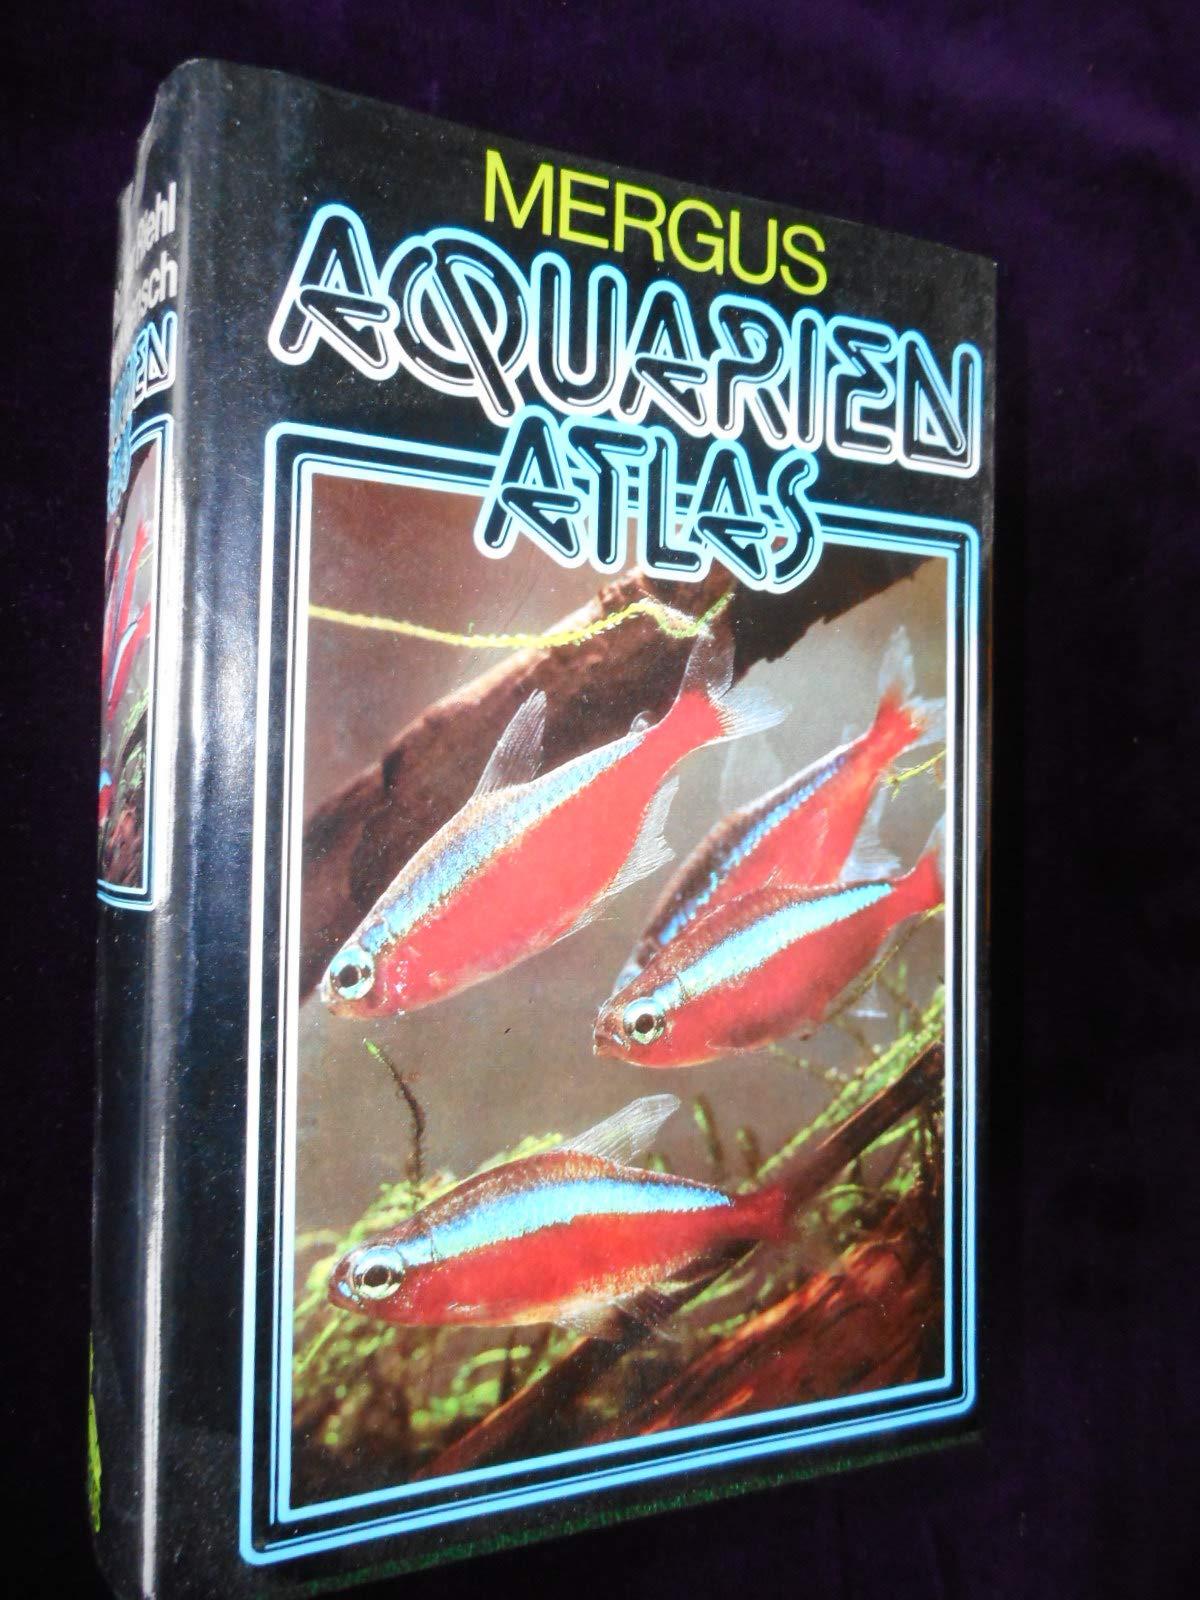 Aquarien Atlas 1